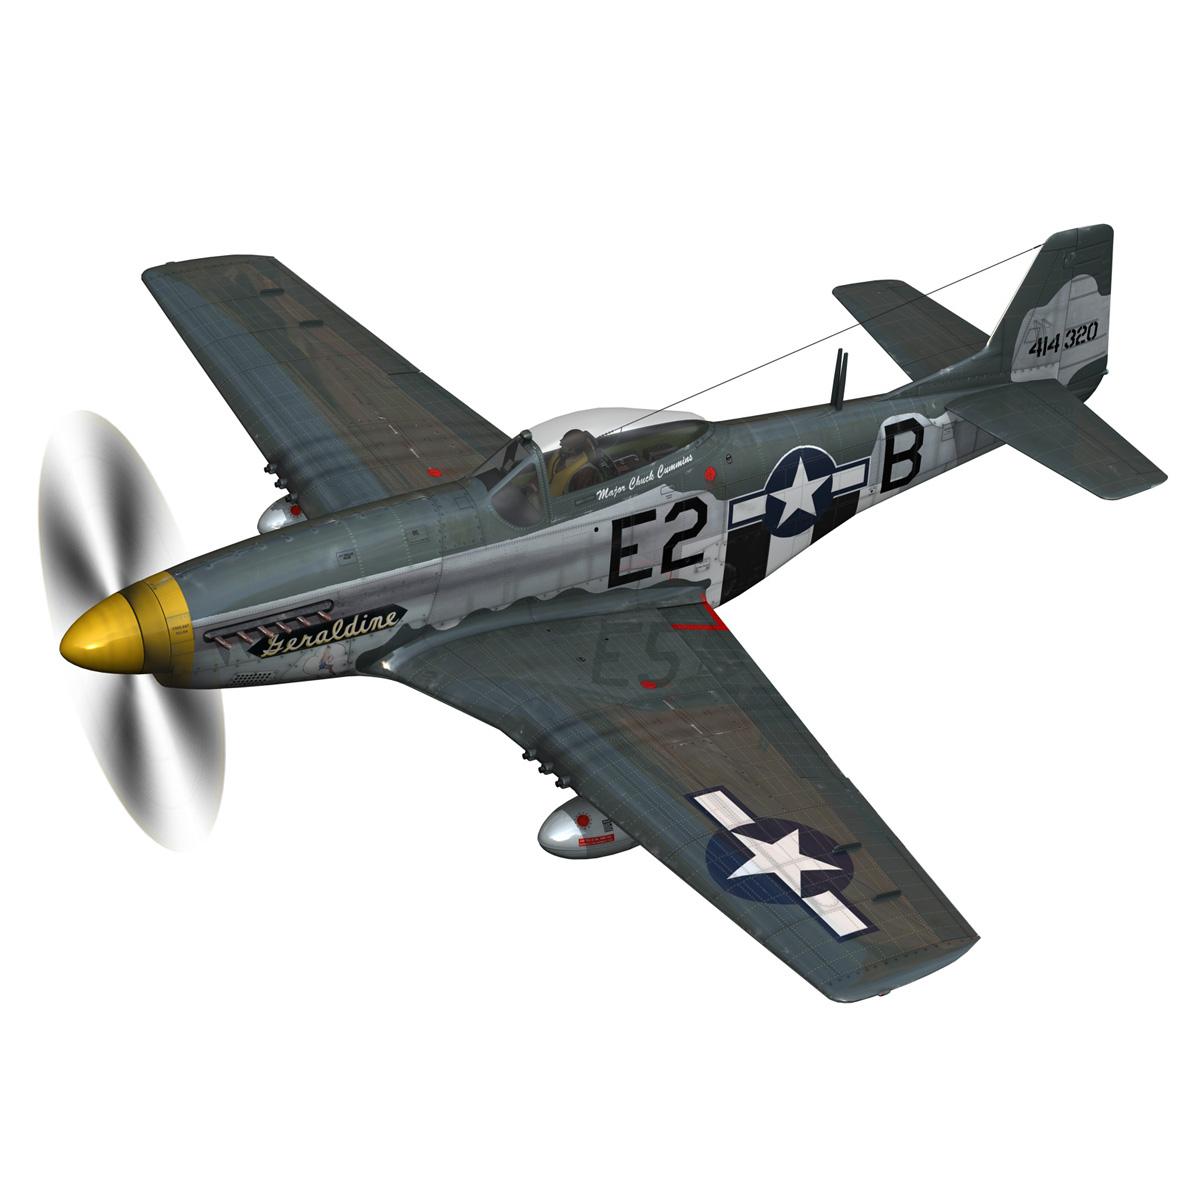 North American P-51D - Geraldine 3d model fbx c4d lwo obj 265940